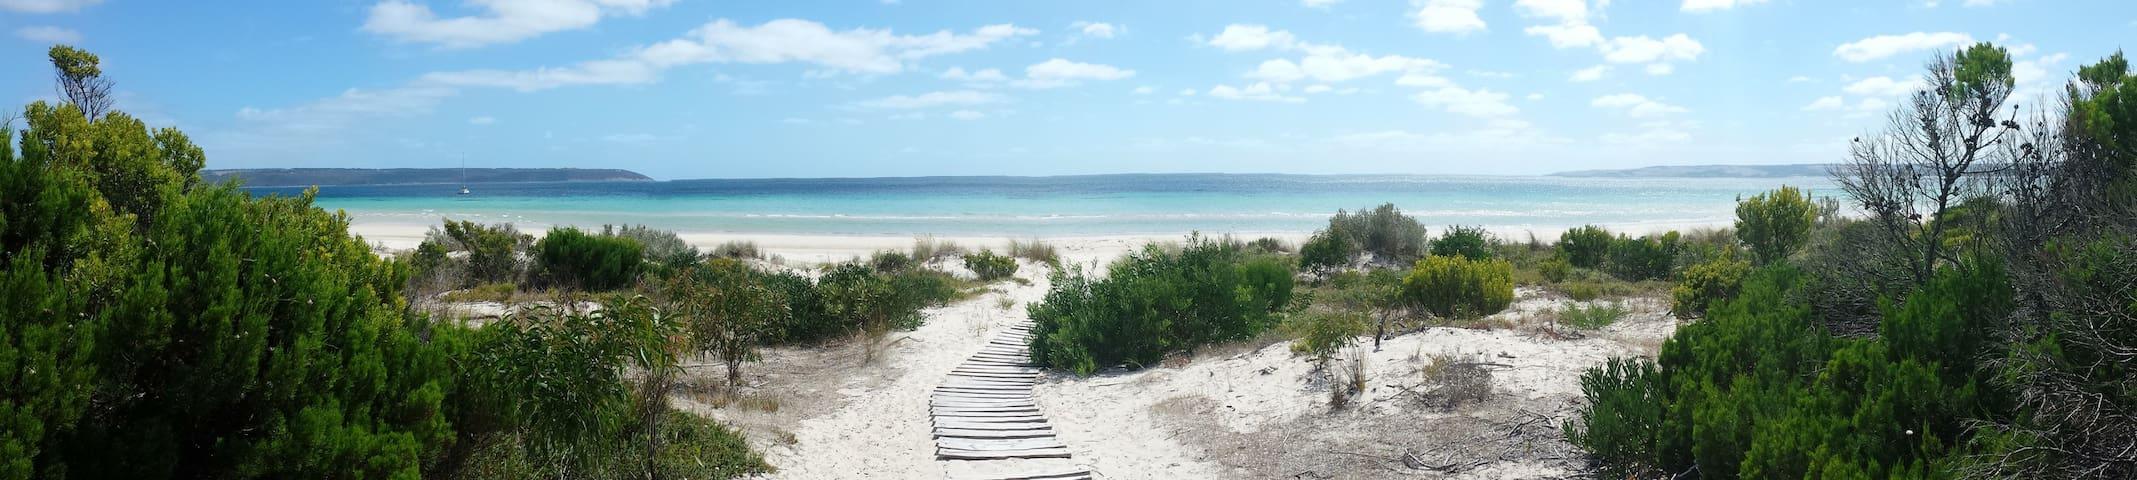 Strandmarken - Beach house - Island Beach